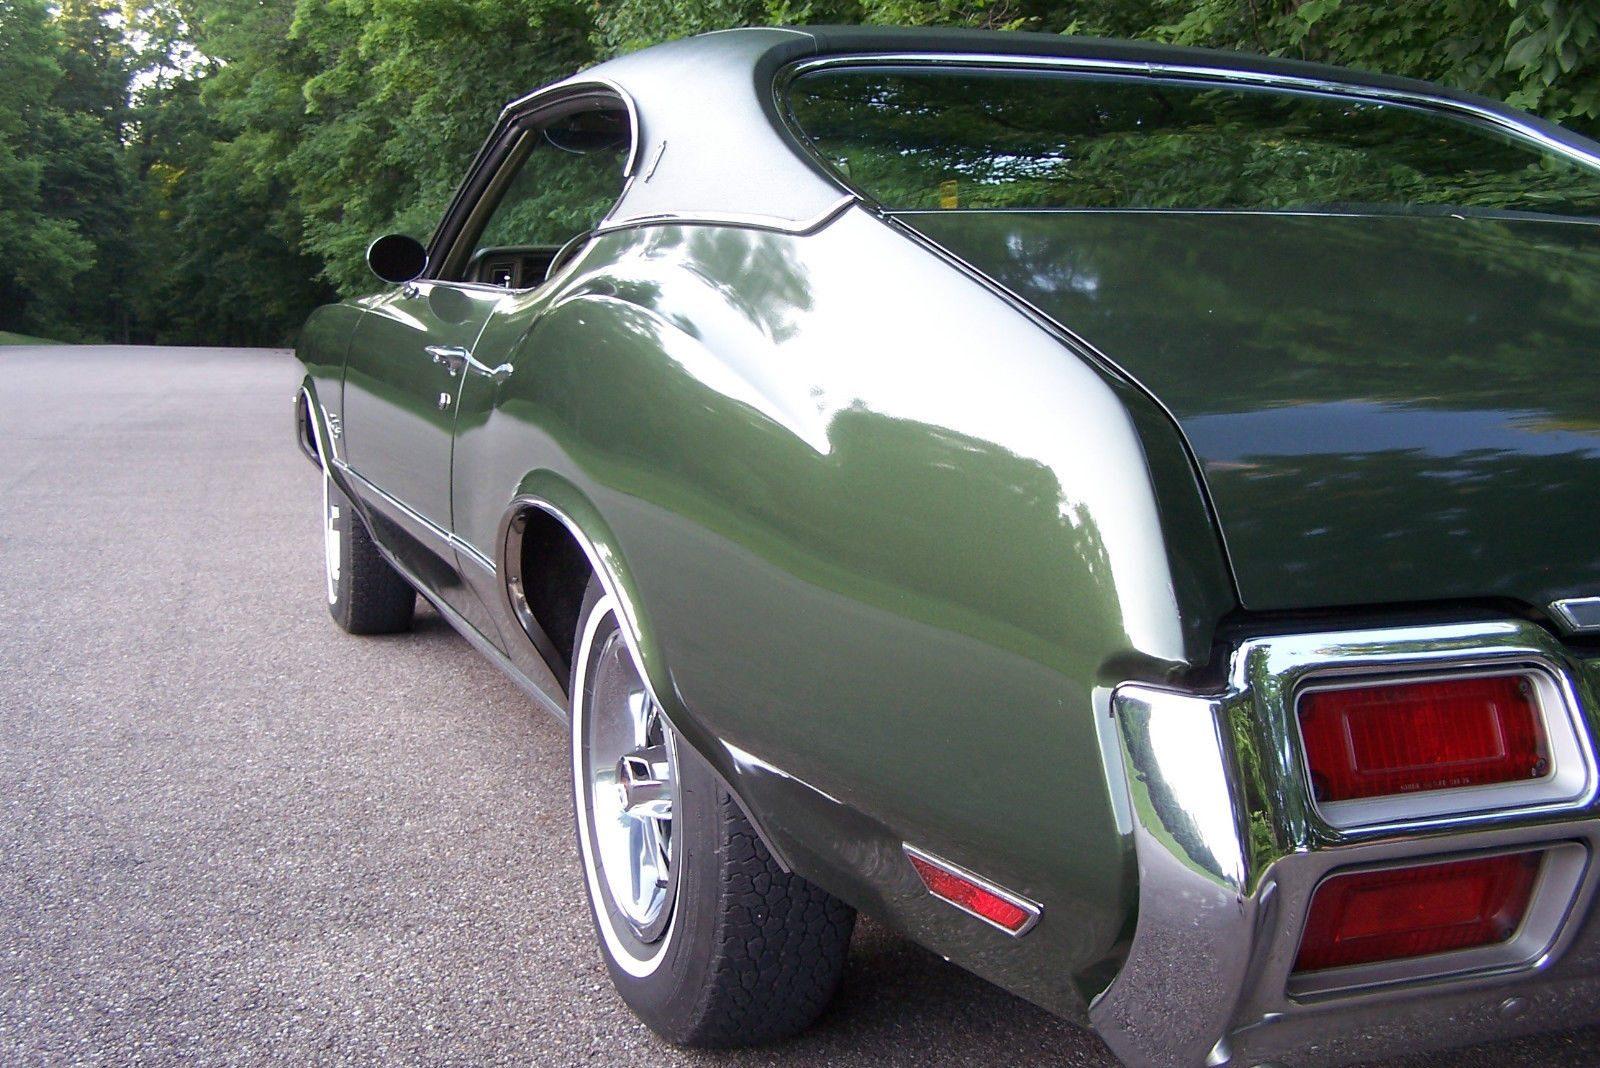 Certified Original! 34,290 Mile 1971 Oldsmobile Cutlass S